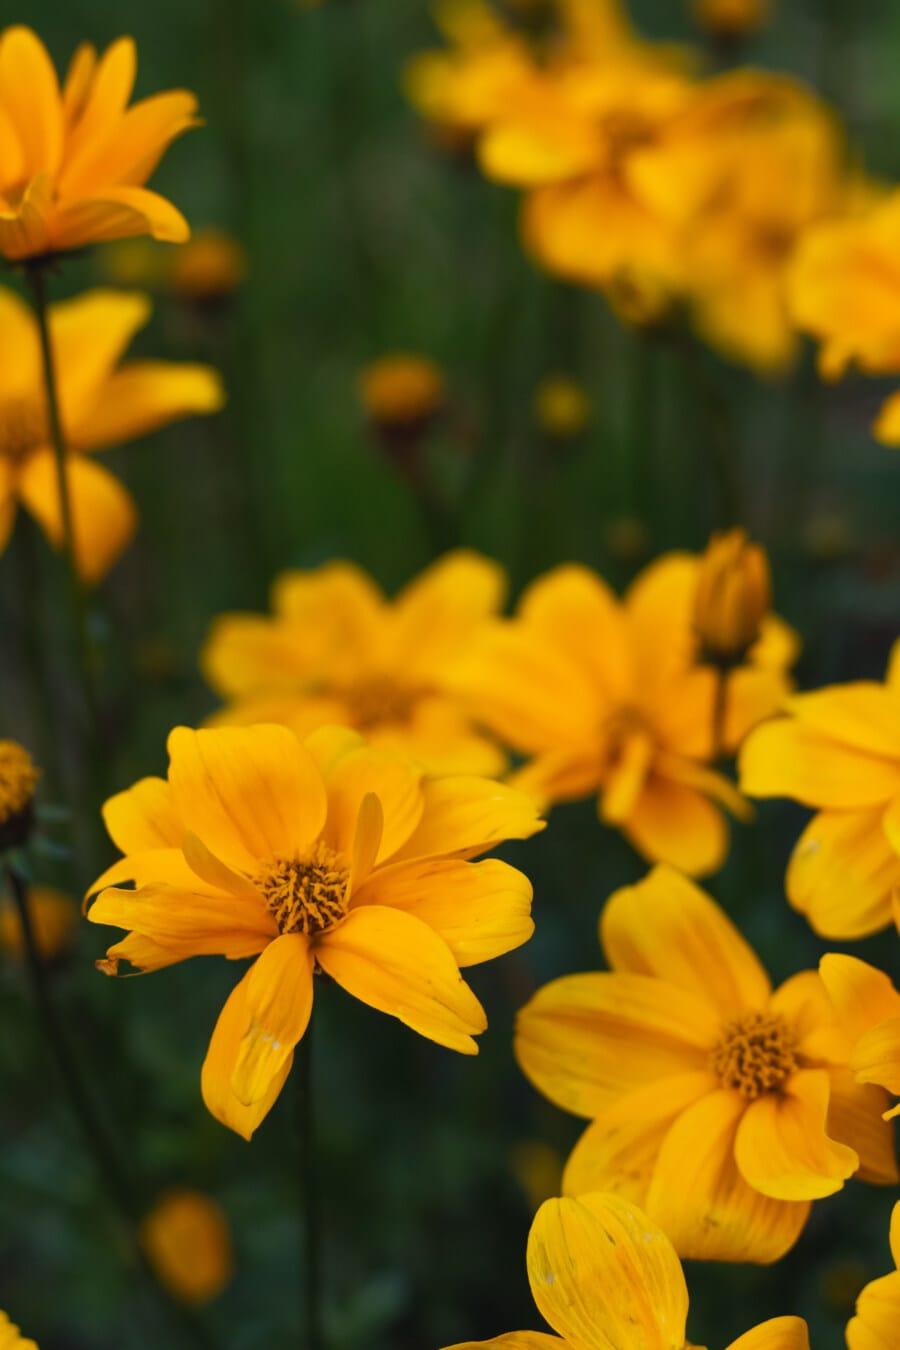 flower garden, yellowish brown, flowers, orange yellow, pistil, flower, spring, plant, flora, blossom